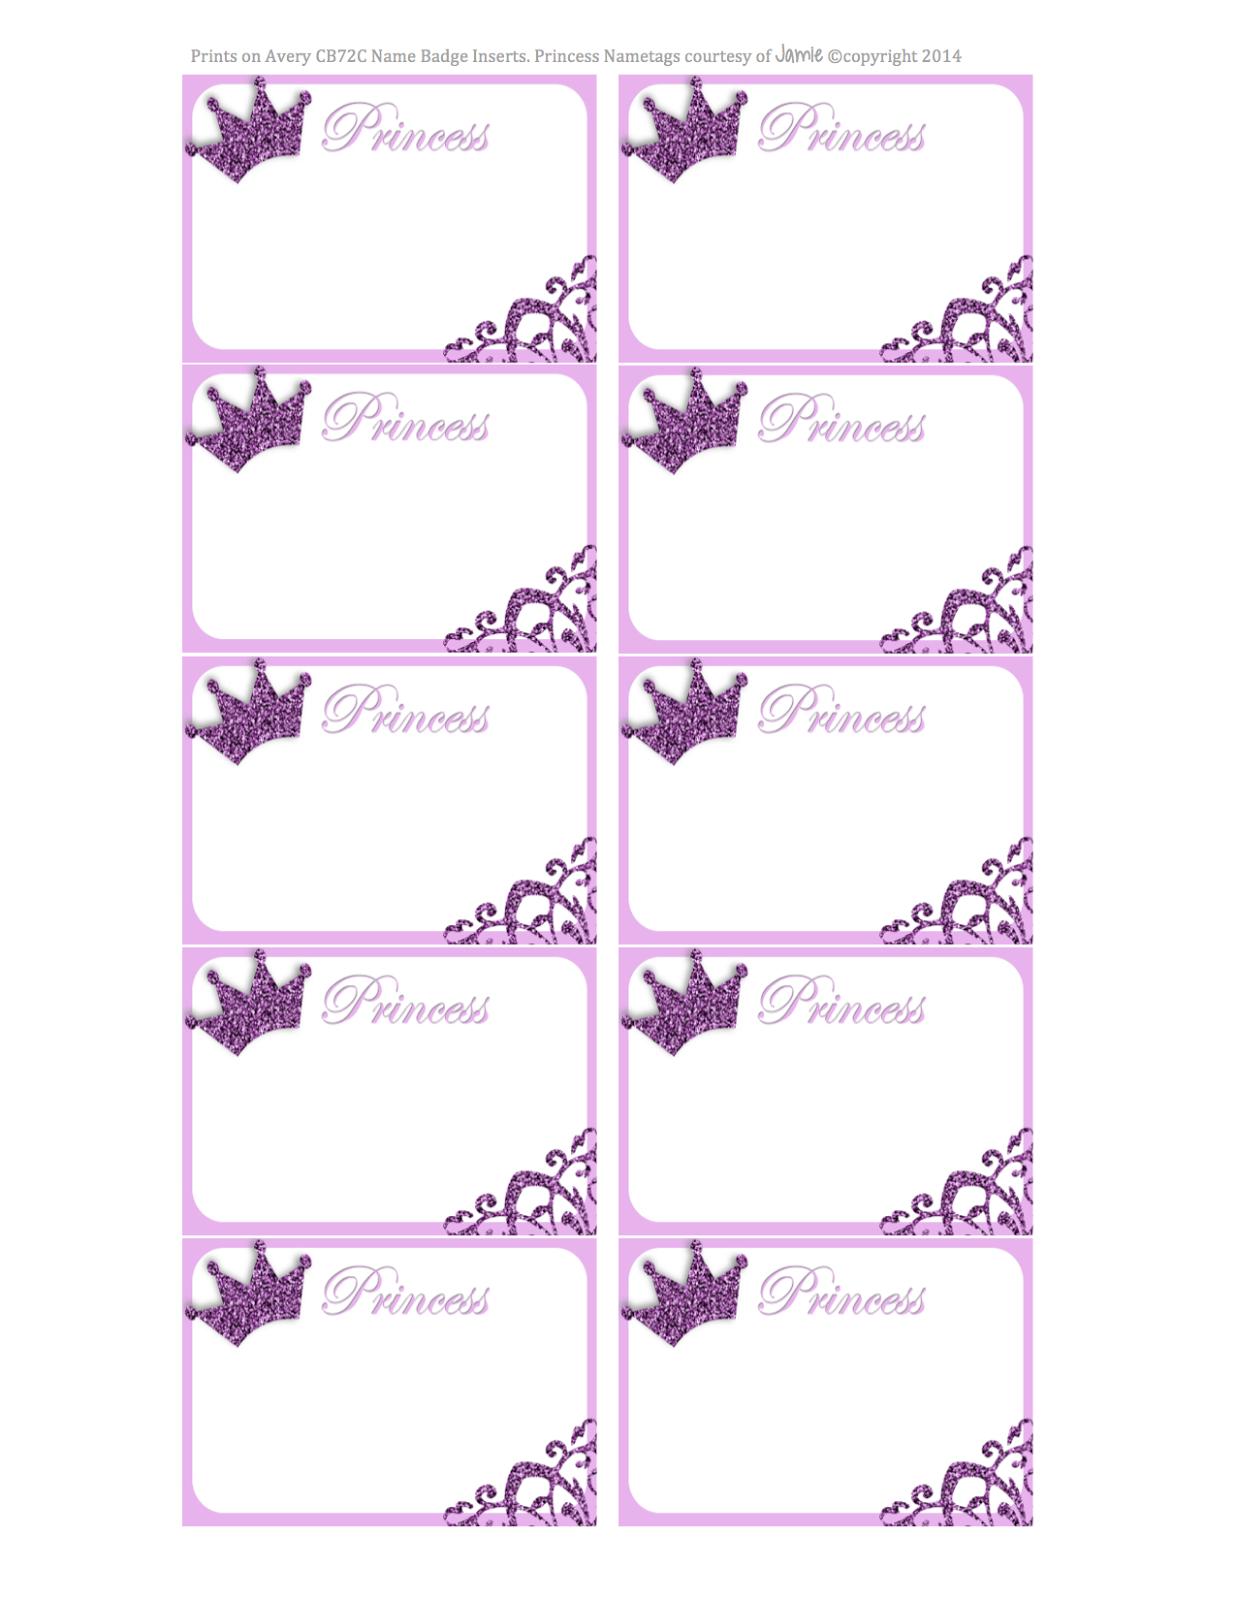 My Fashionable Designs: Princess Nametags Or Labels - Free Printable - Free Printable Name Tags